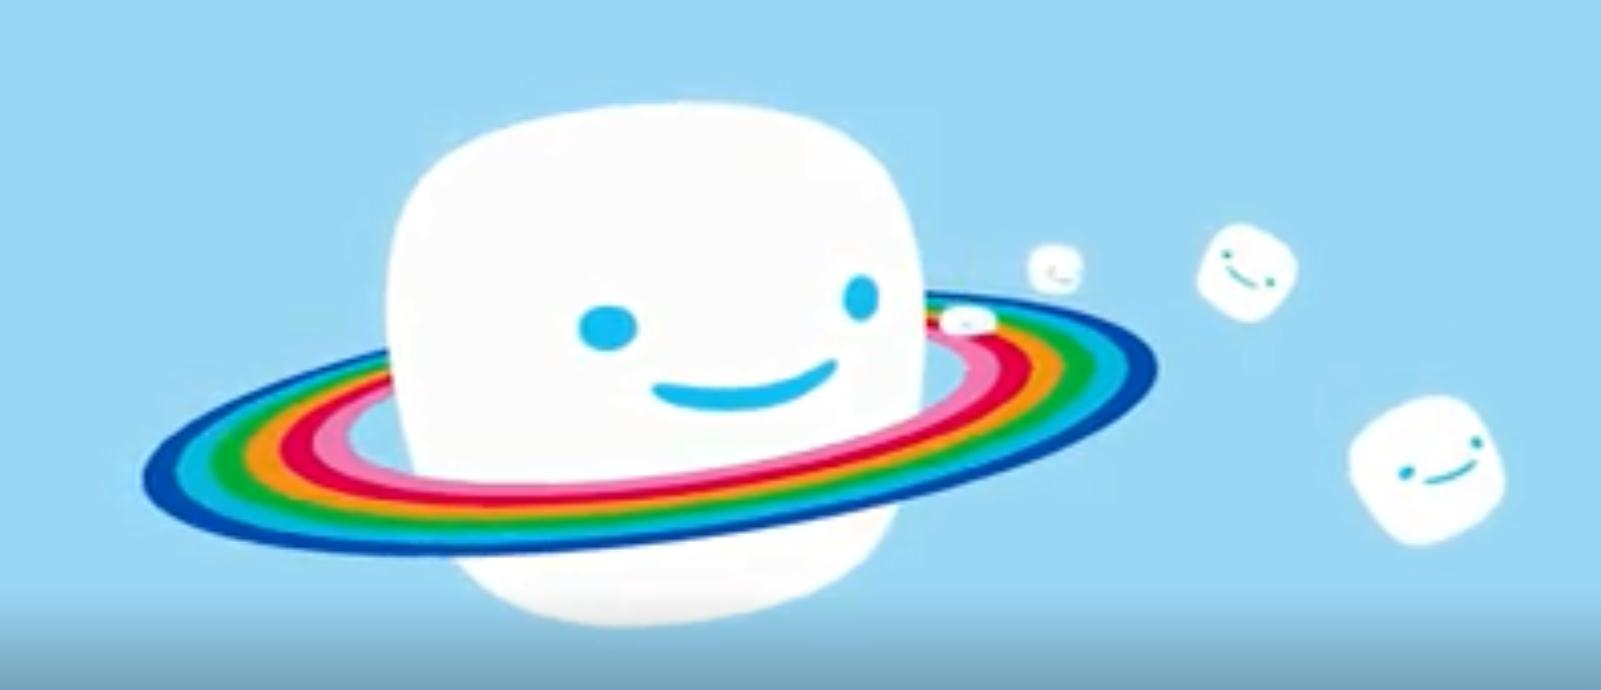 "Jet-Puffed棉花糖食品包装设计""喷射的彩虹之路"""